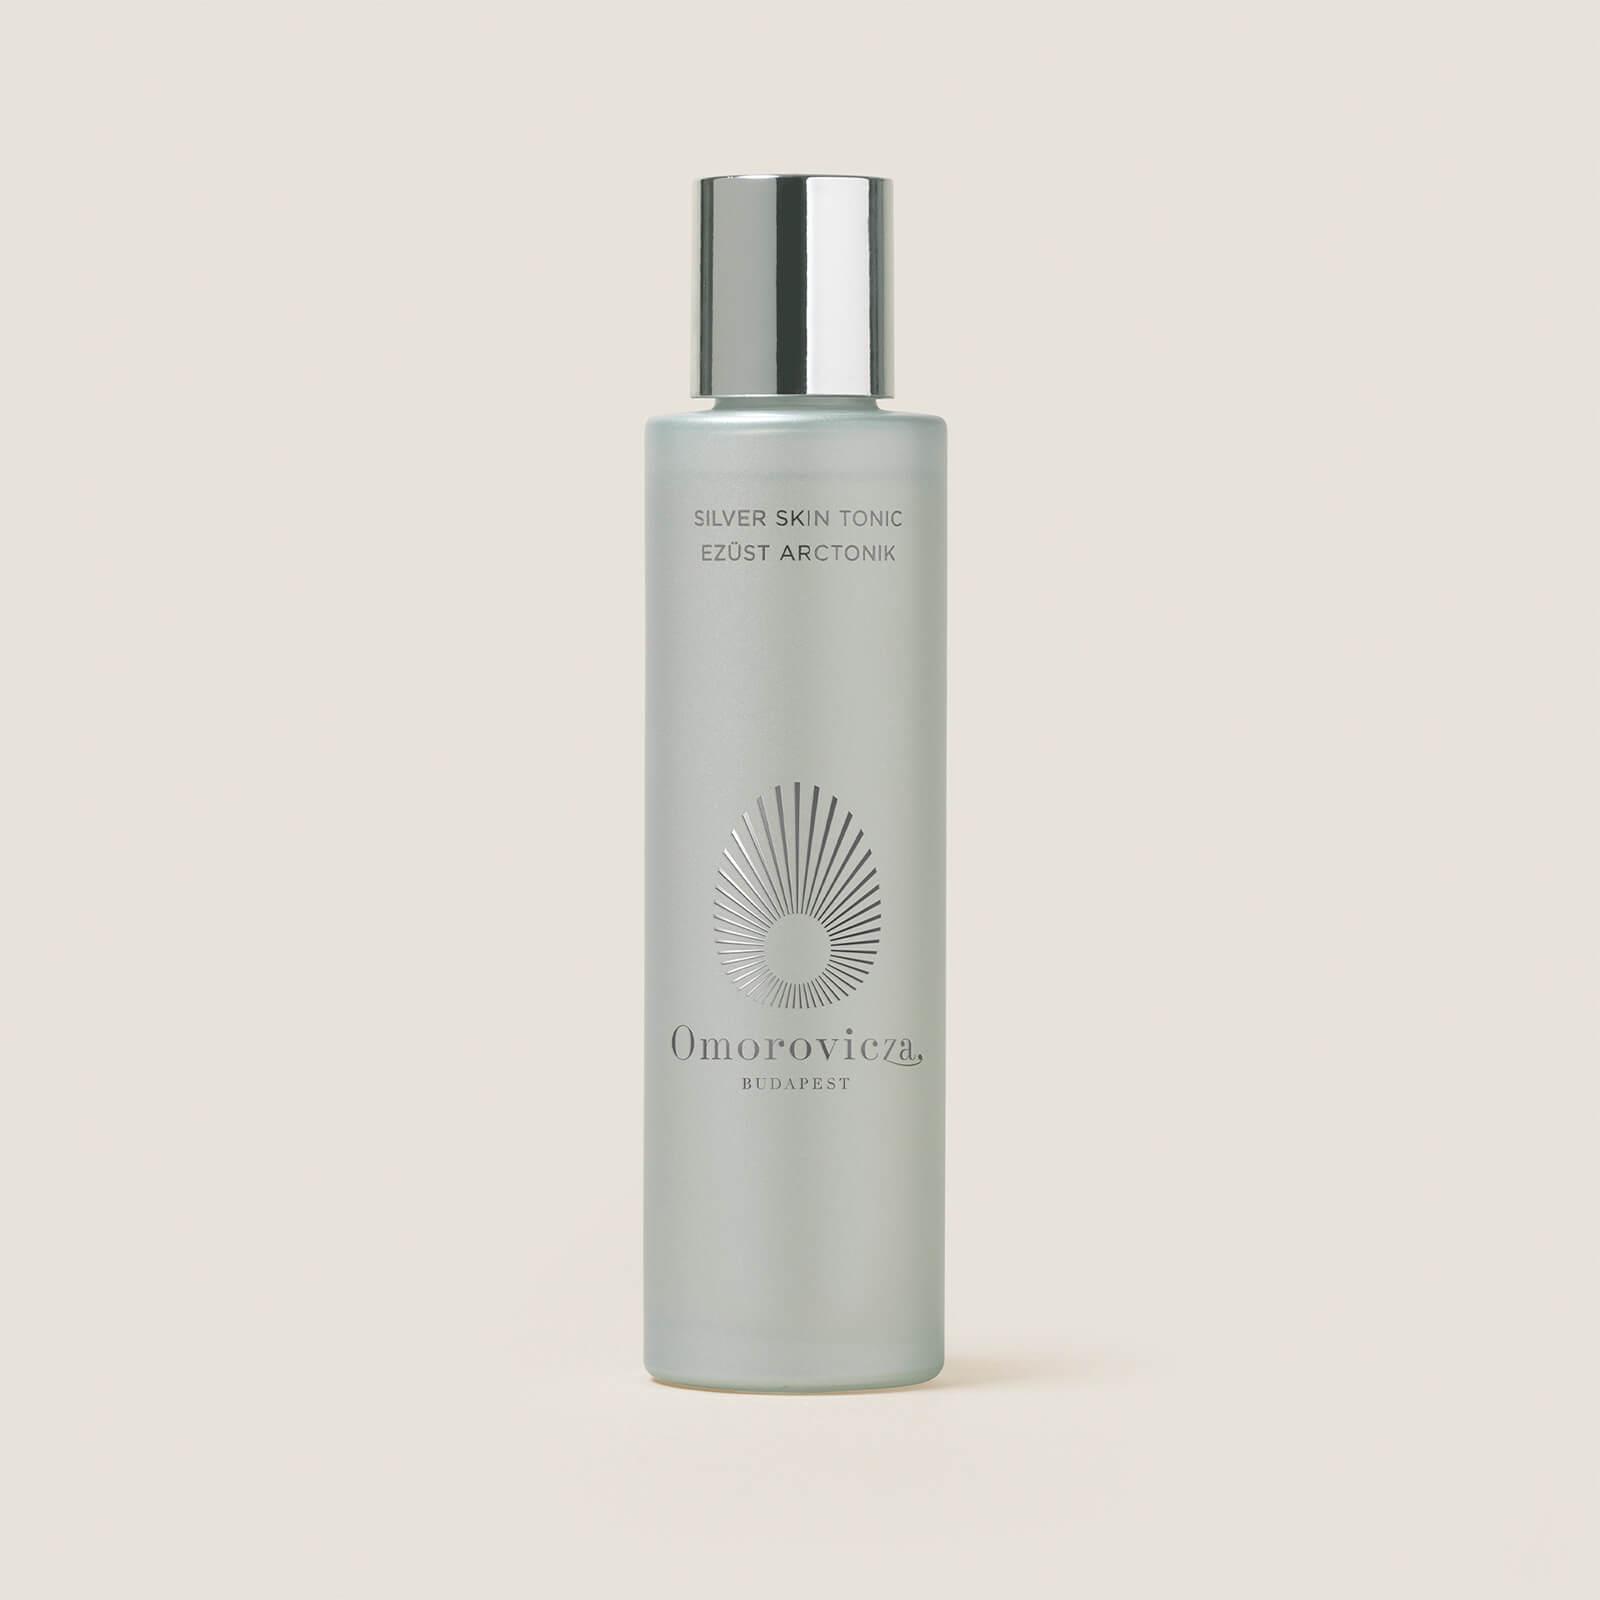 Купить Omorovicza Silver Skin Tonic 100ml